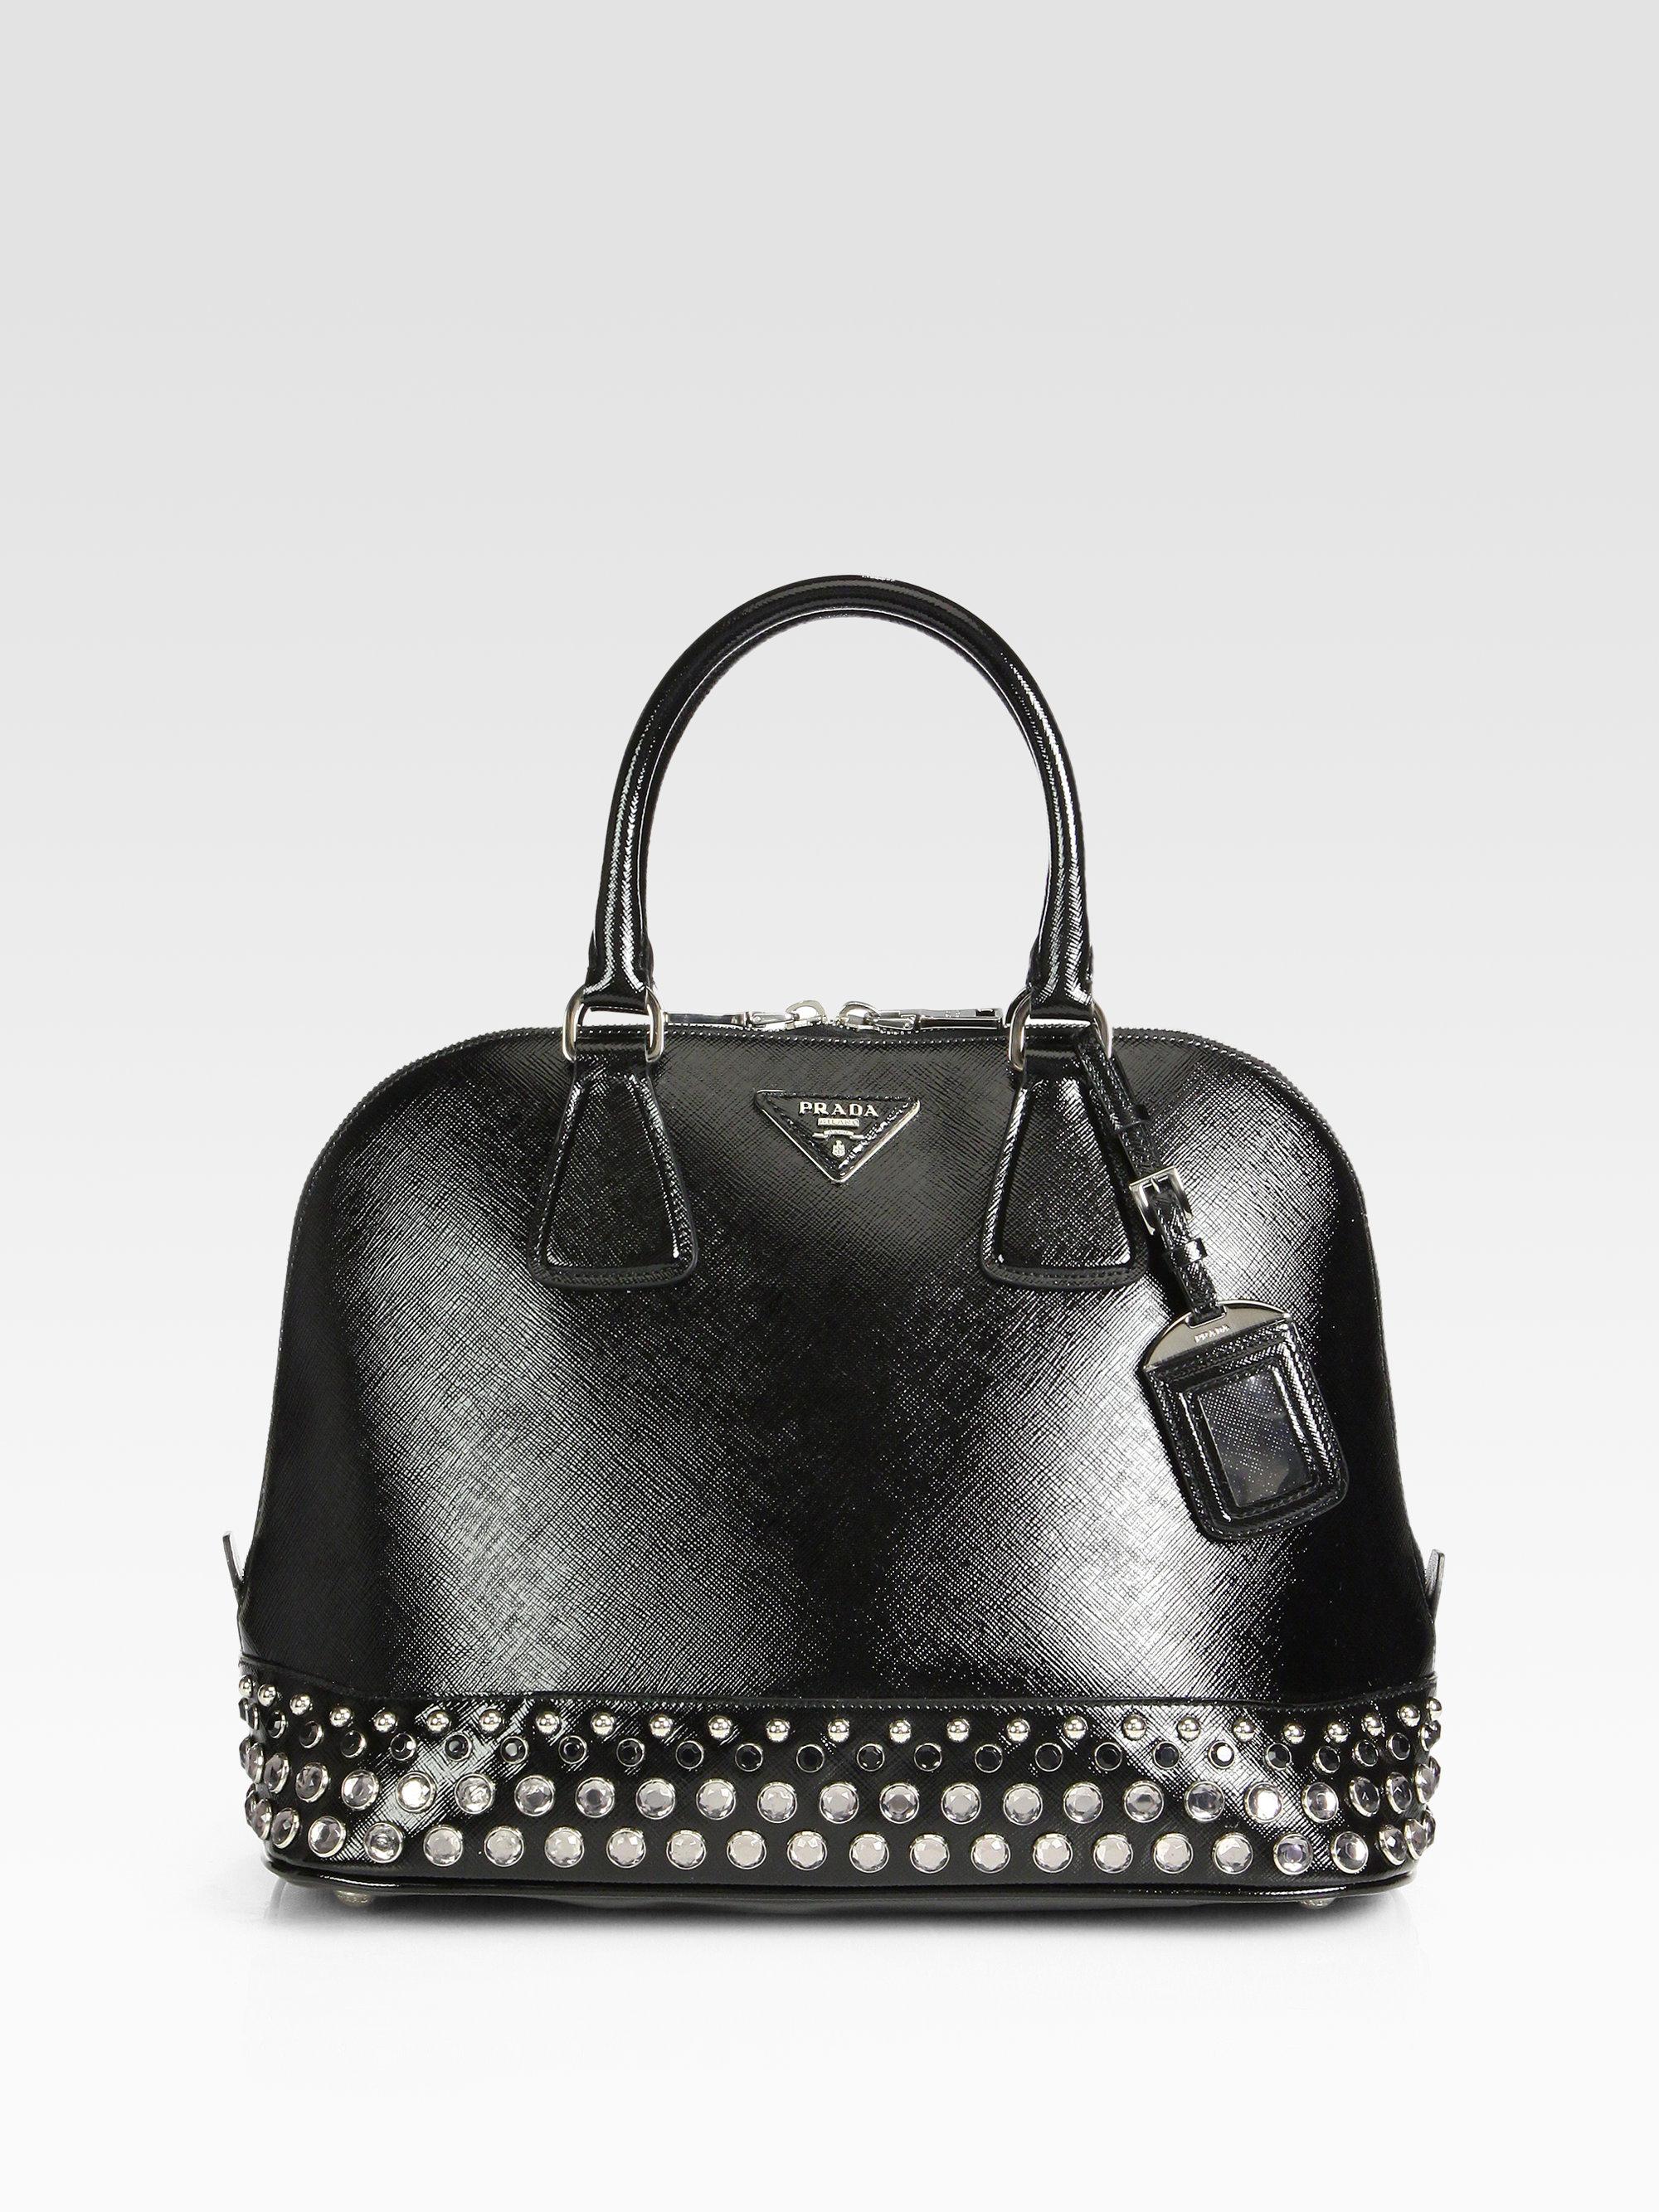 prada billfold wallet - Prada Saffiano Vernice Embellished Medium Promenade Top Handle Bag ...